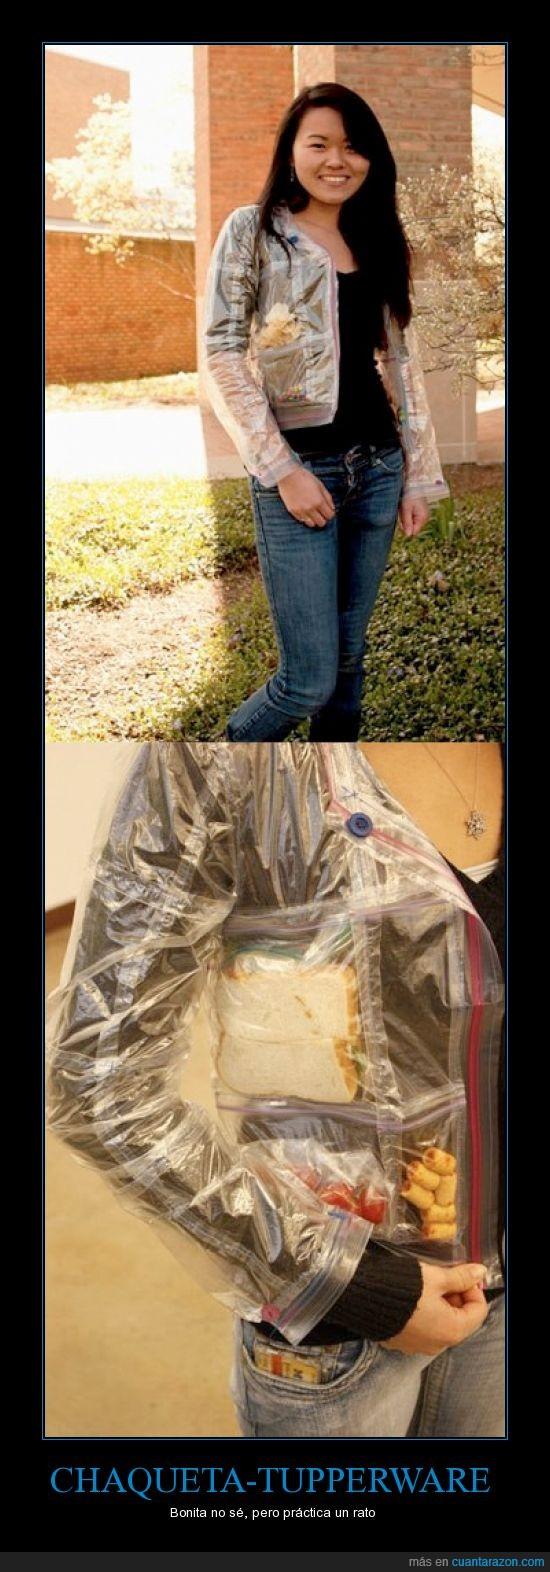 bolsa,chaqueta,comida,meter,ropa,transparente,ziplock